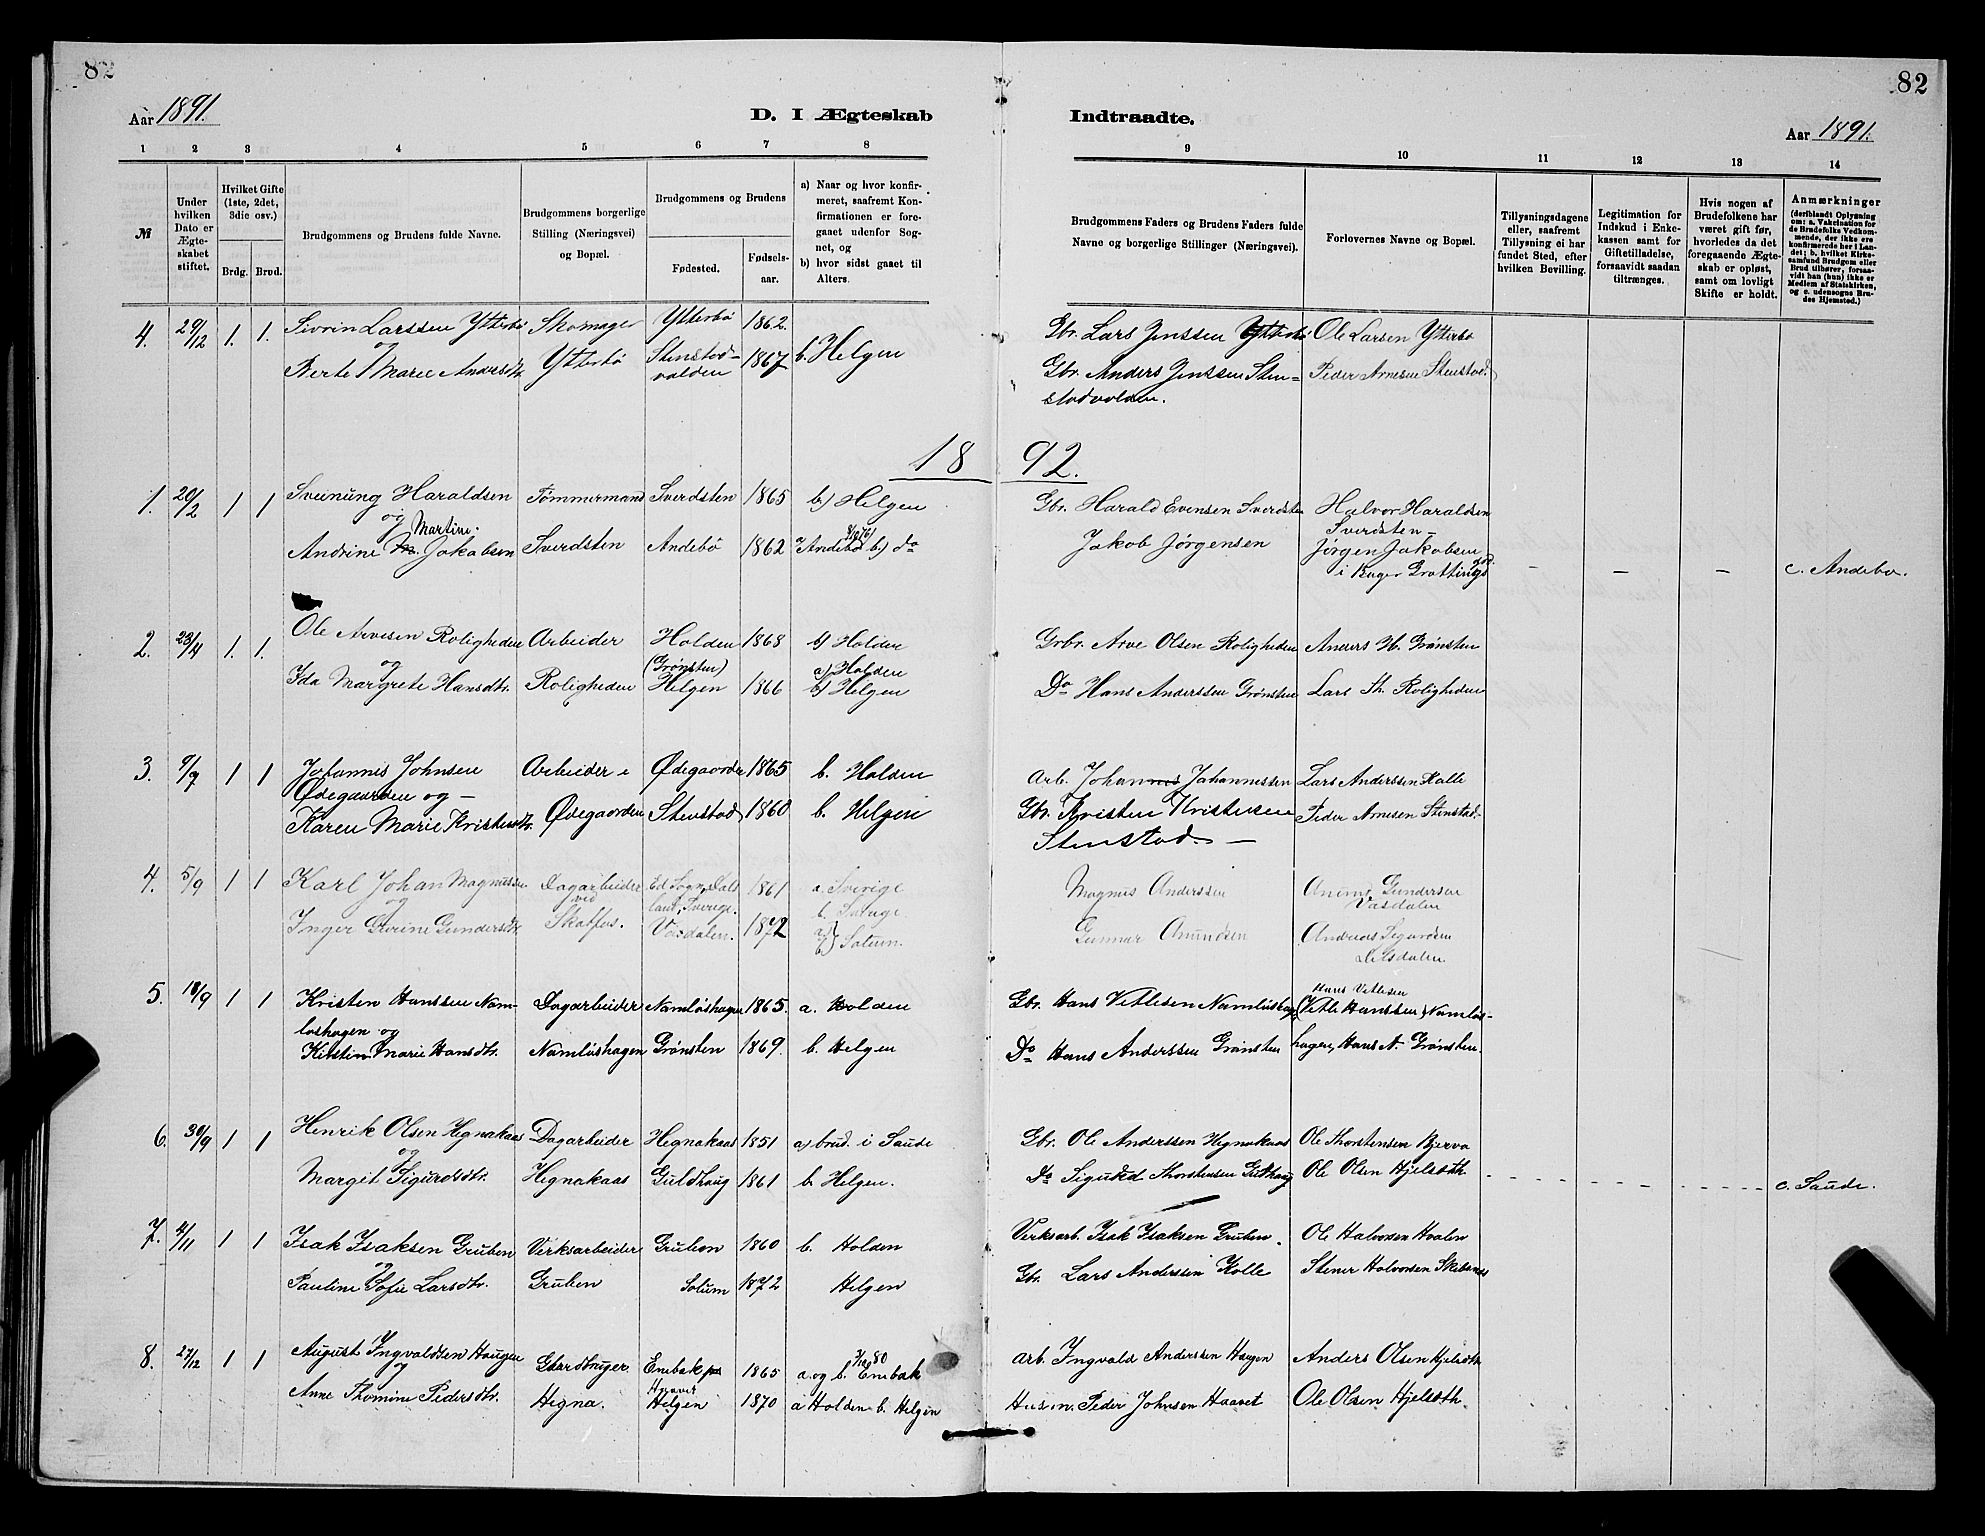 SAKO, Holla kirkebøker, G/Gb/L0001: Klokkerbok nr. II 1, 1882-1897, s. 82